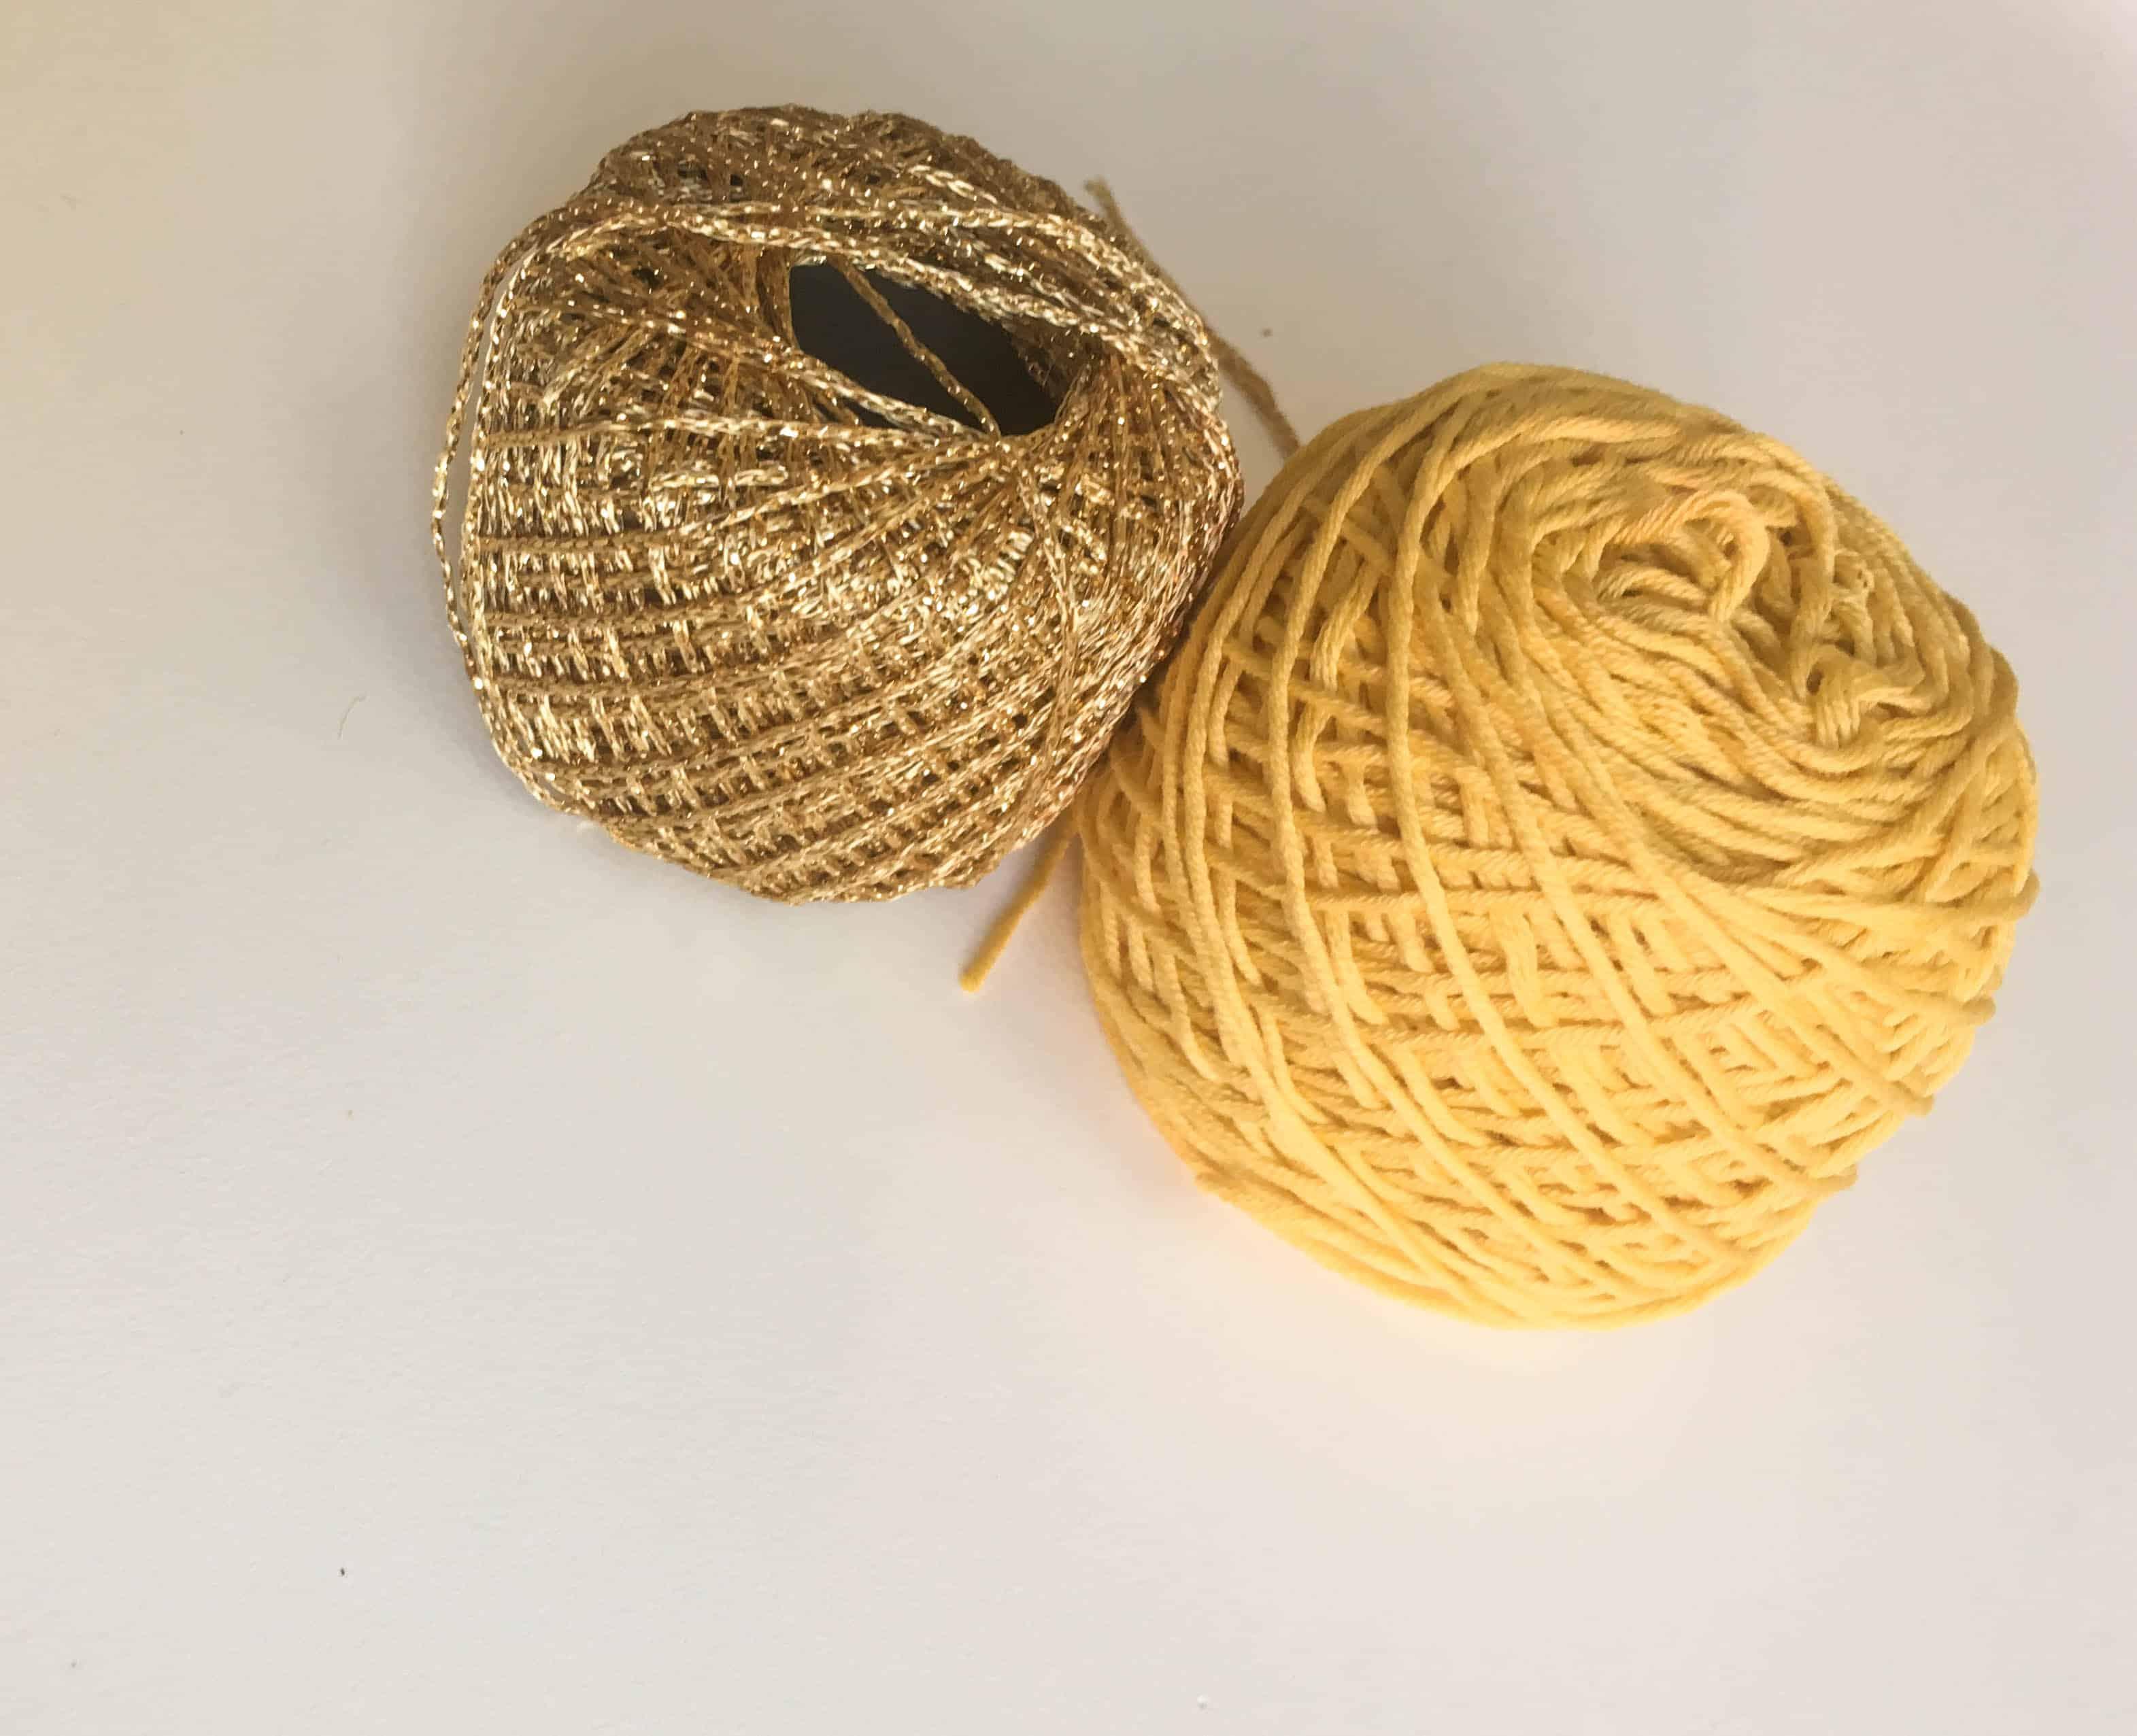 gold and yellow crochet yarn